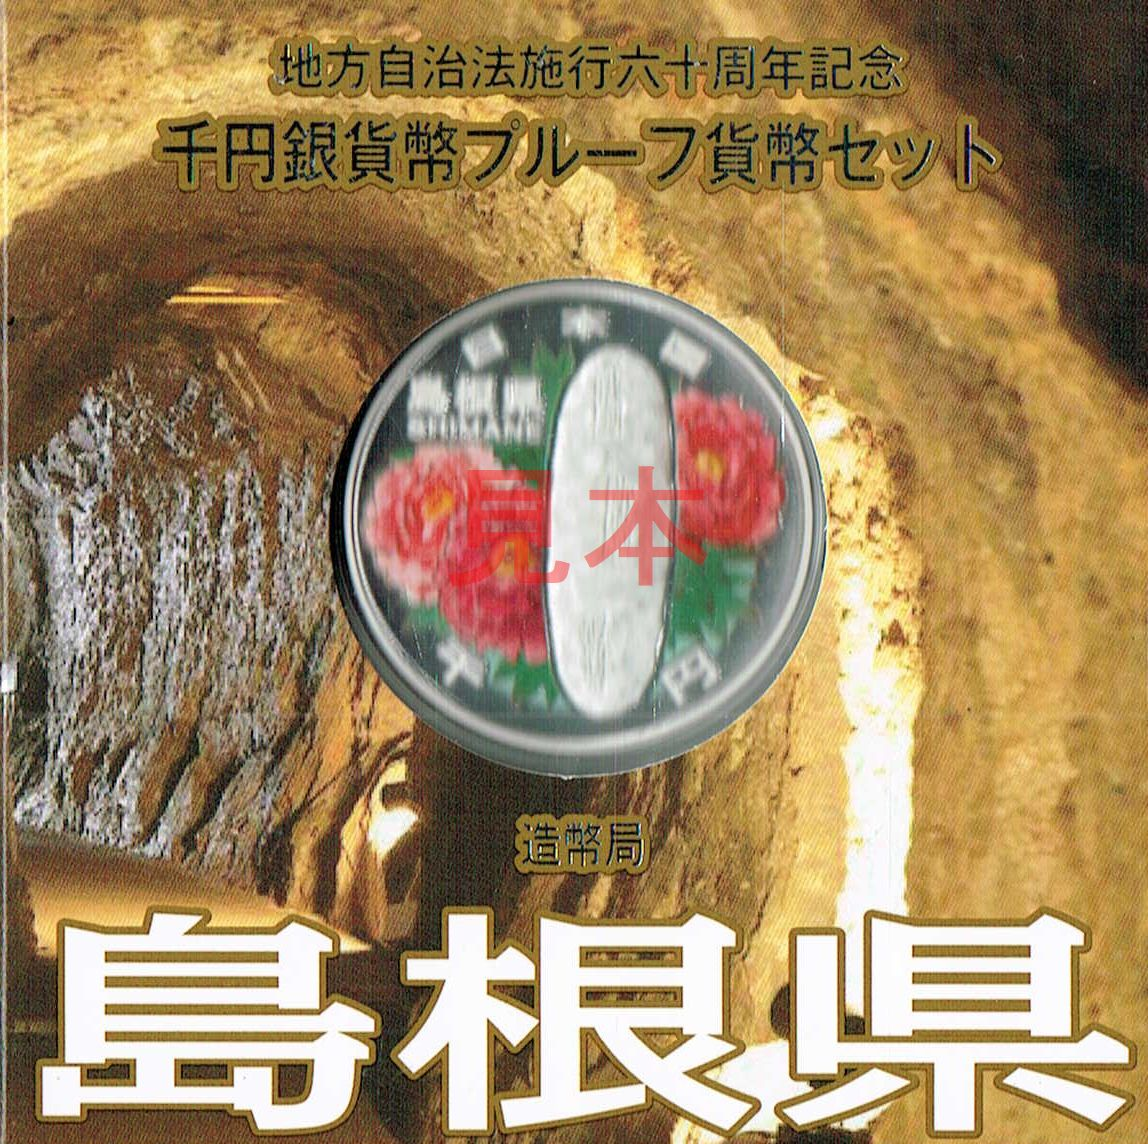 商品名「地方自治法施行60周年記念千円銀貨幣プルーフ Aセット 島根県」